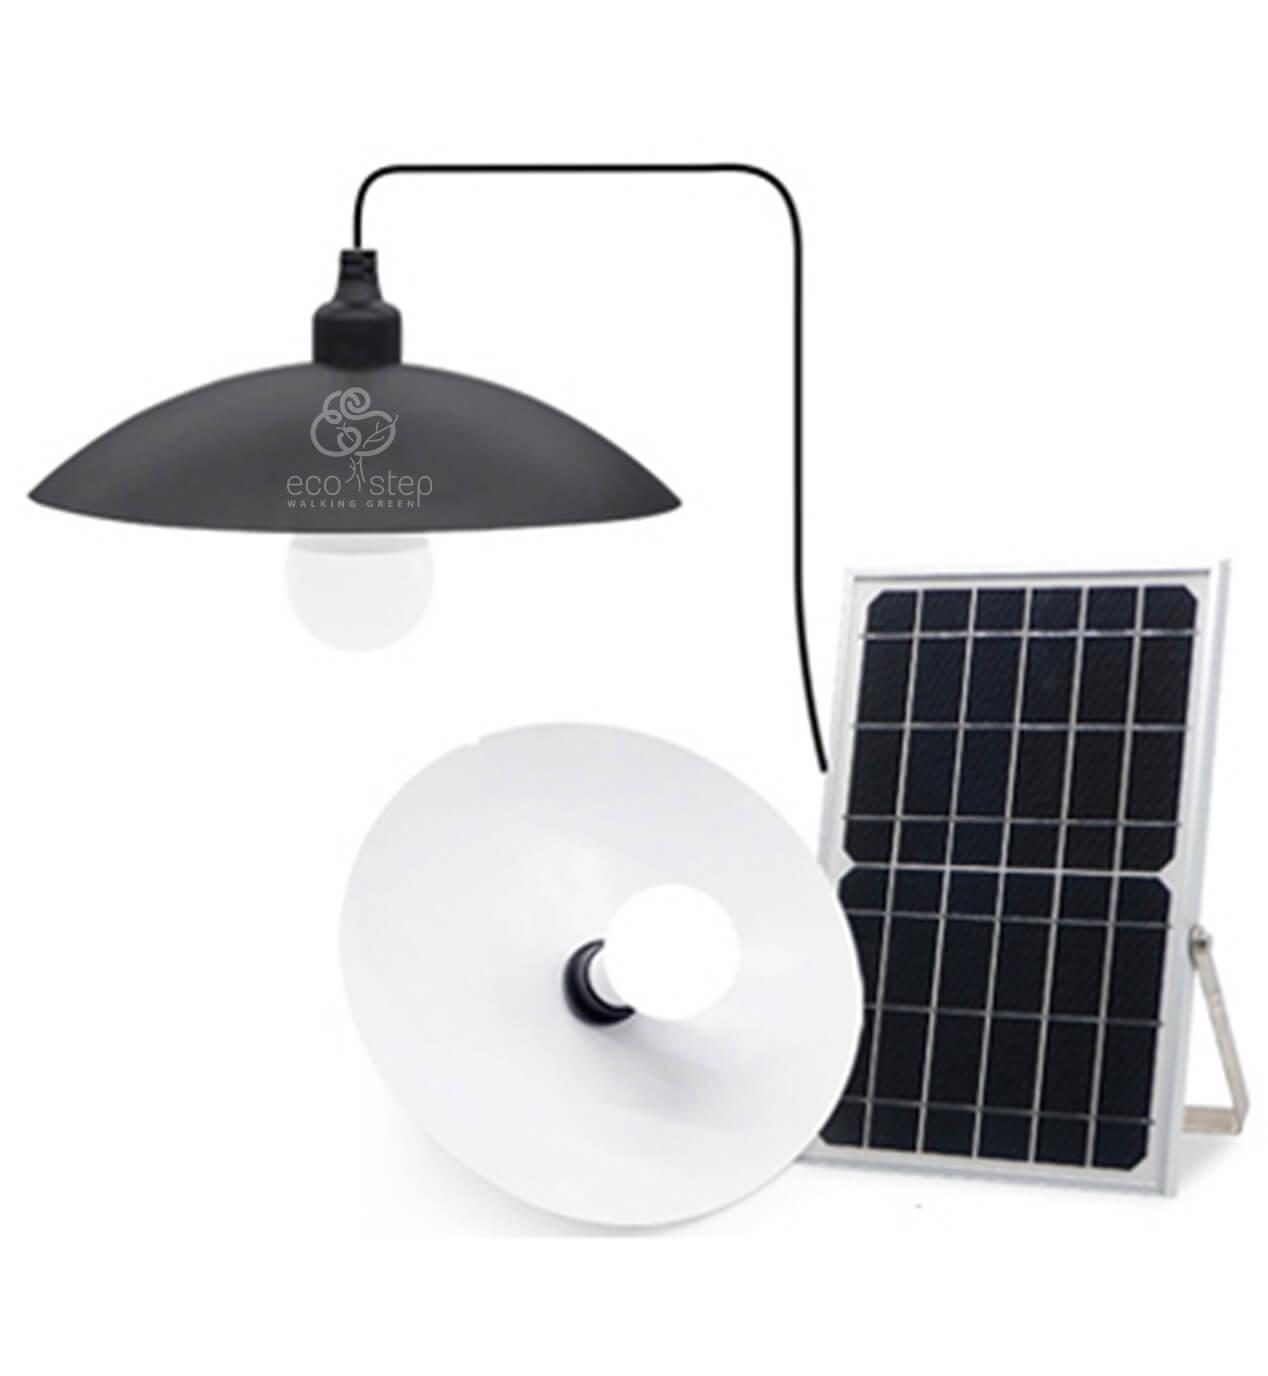 Solar Energy Armenia, Arevayin martkocner, Solar Panels,